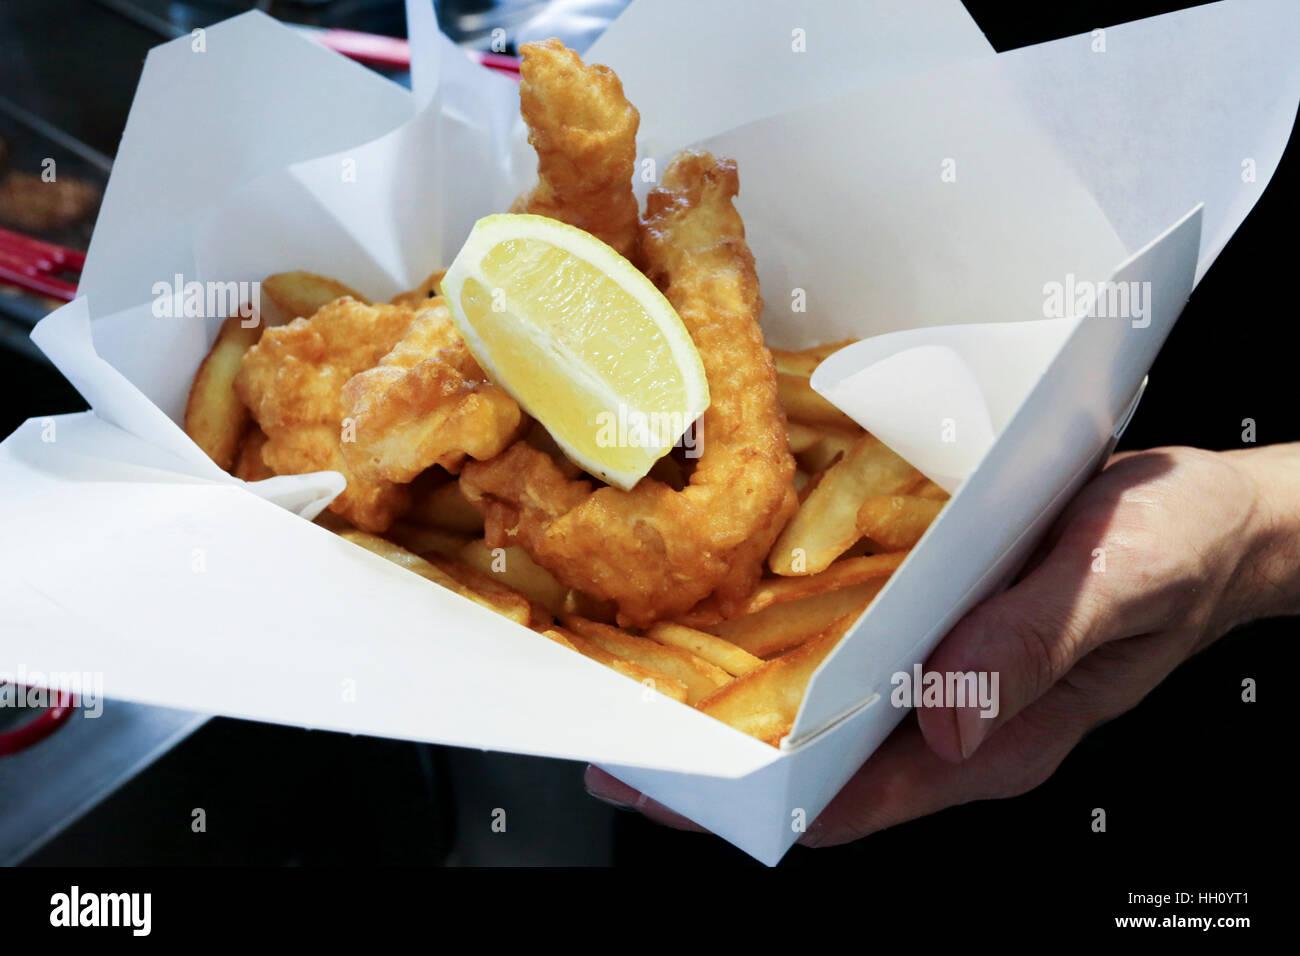 Fish and Chips snack en caja de cartón Imagen De Stock